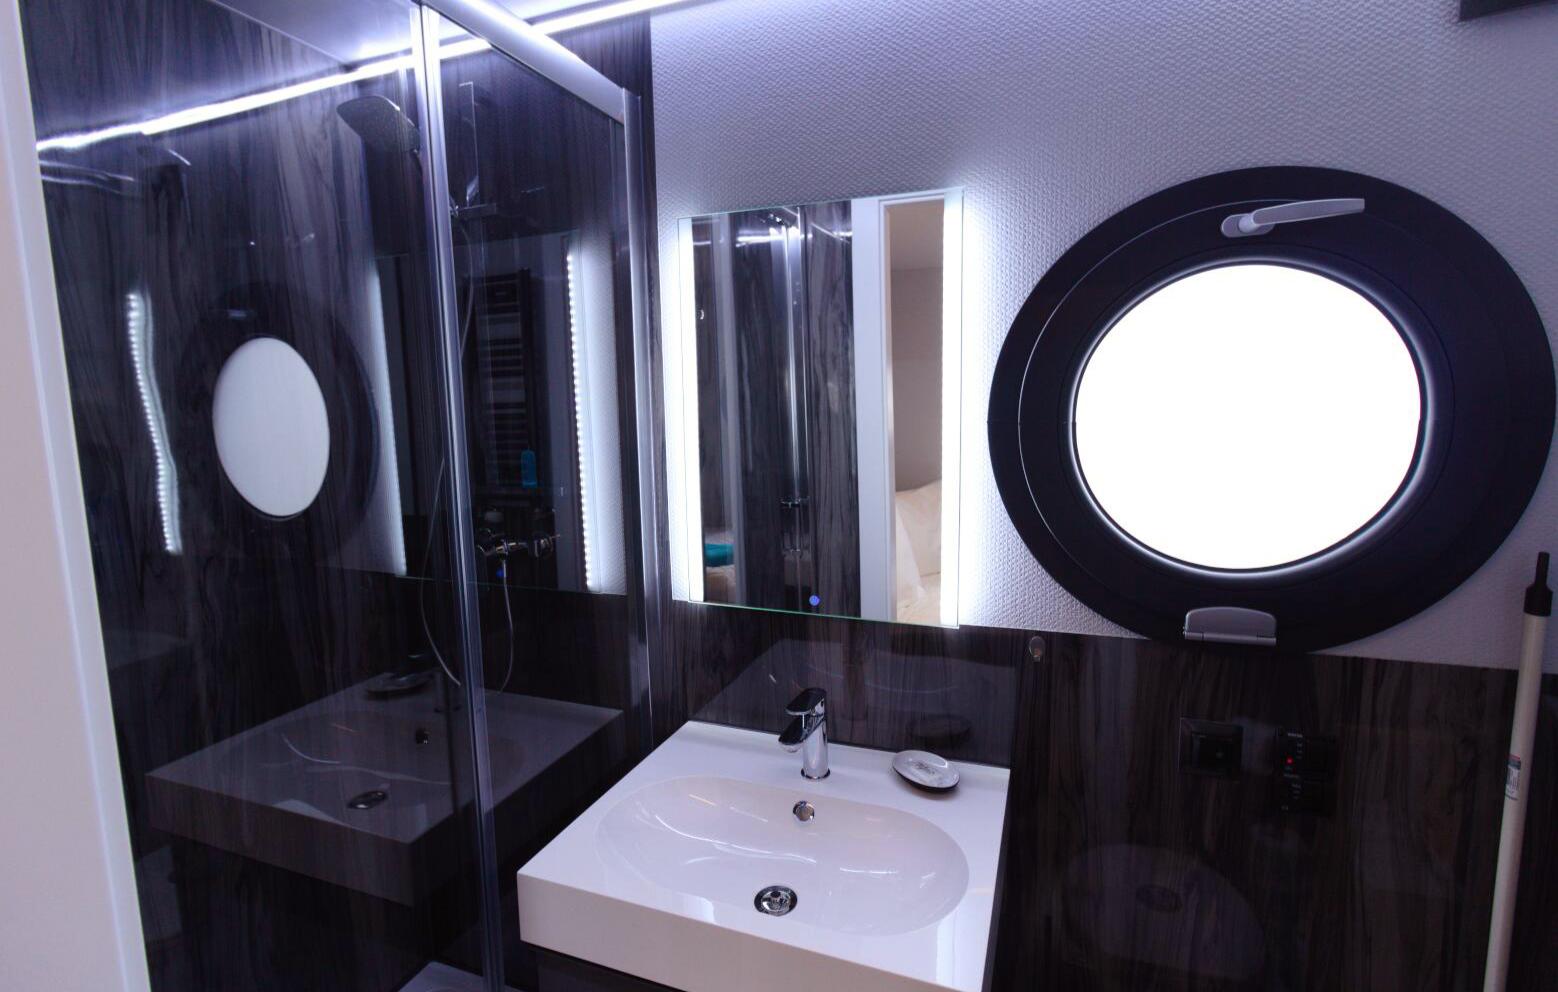 hausboot-uebernachtung-o-sauna-3-tage-2-uen-2-personen-bg2